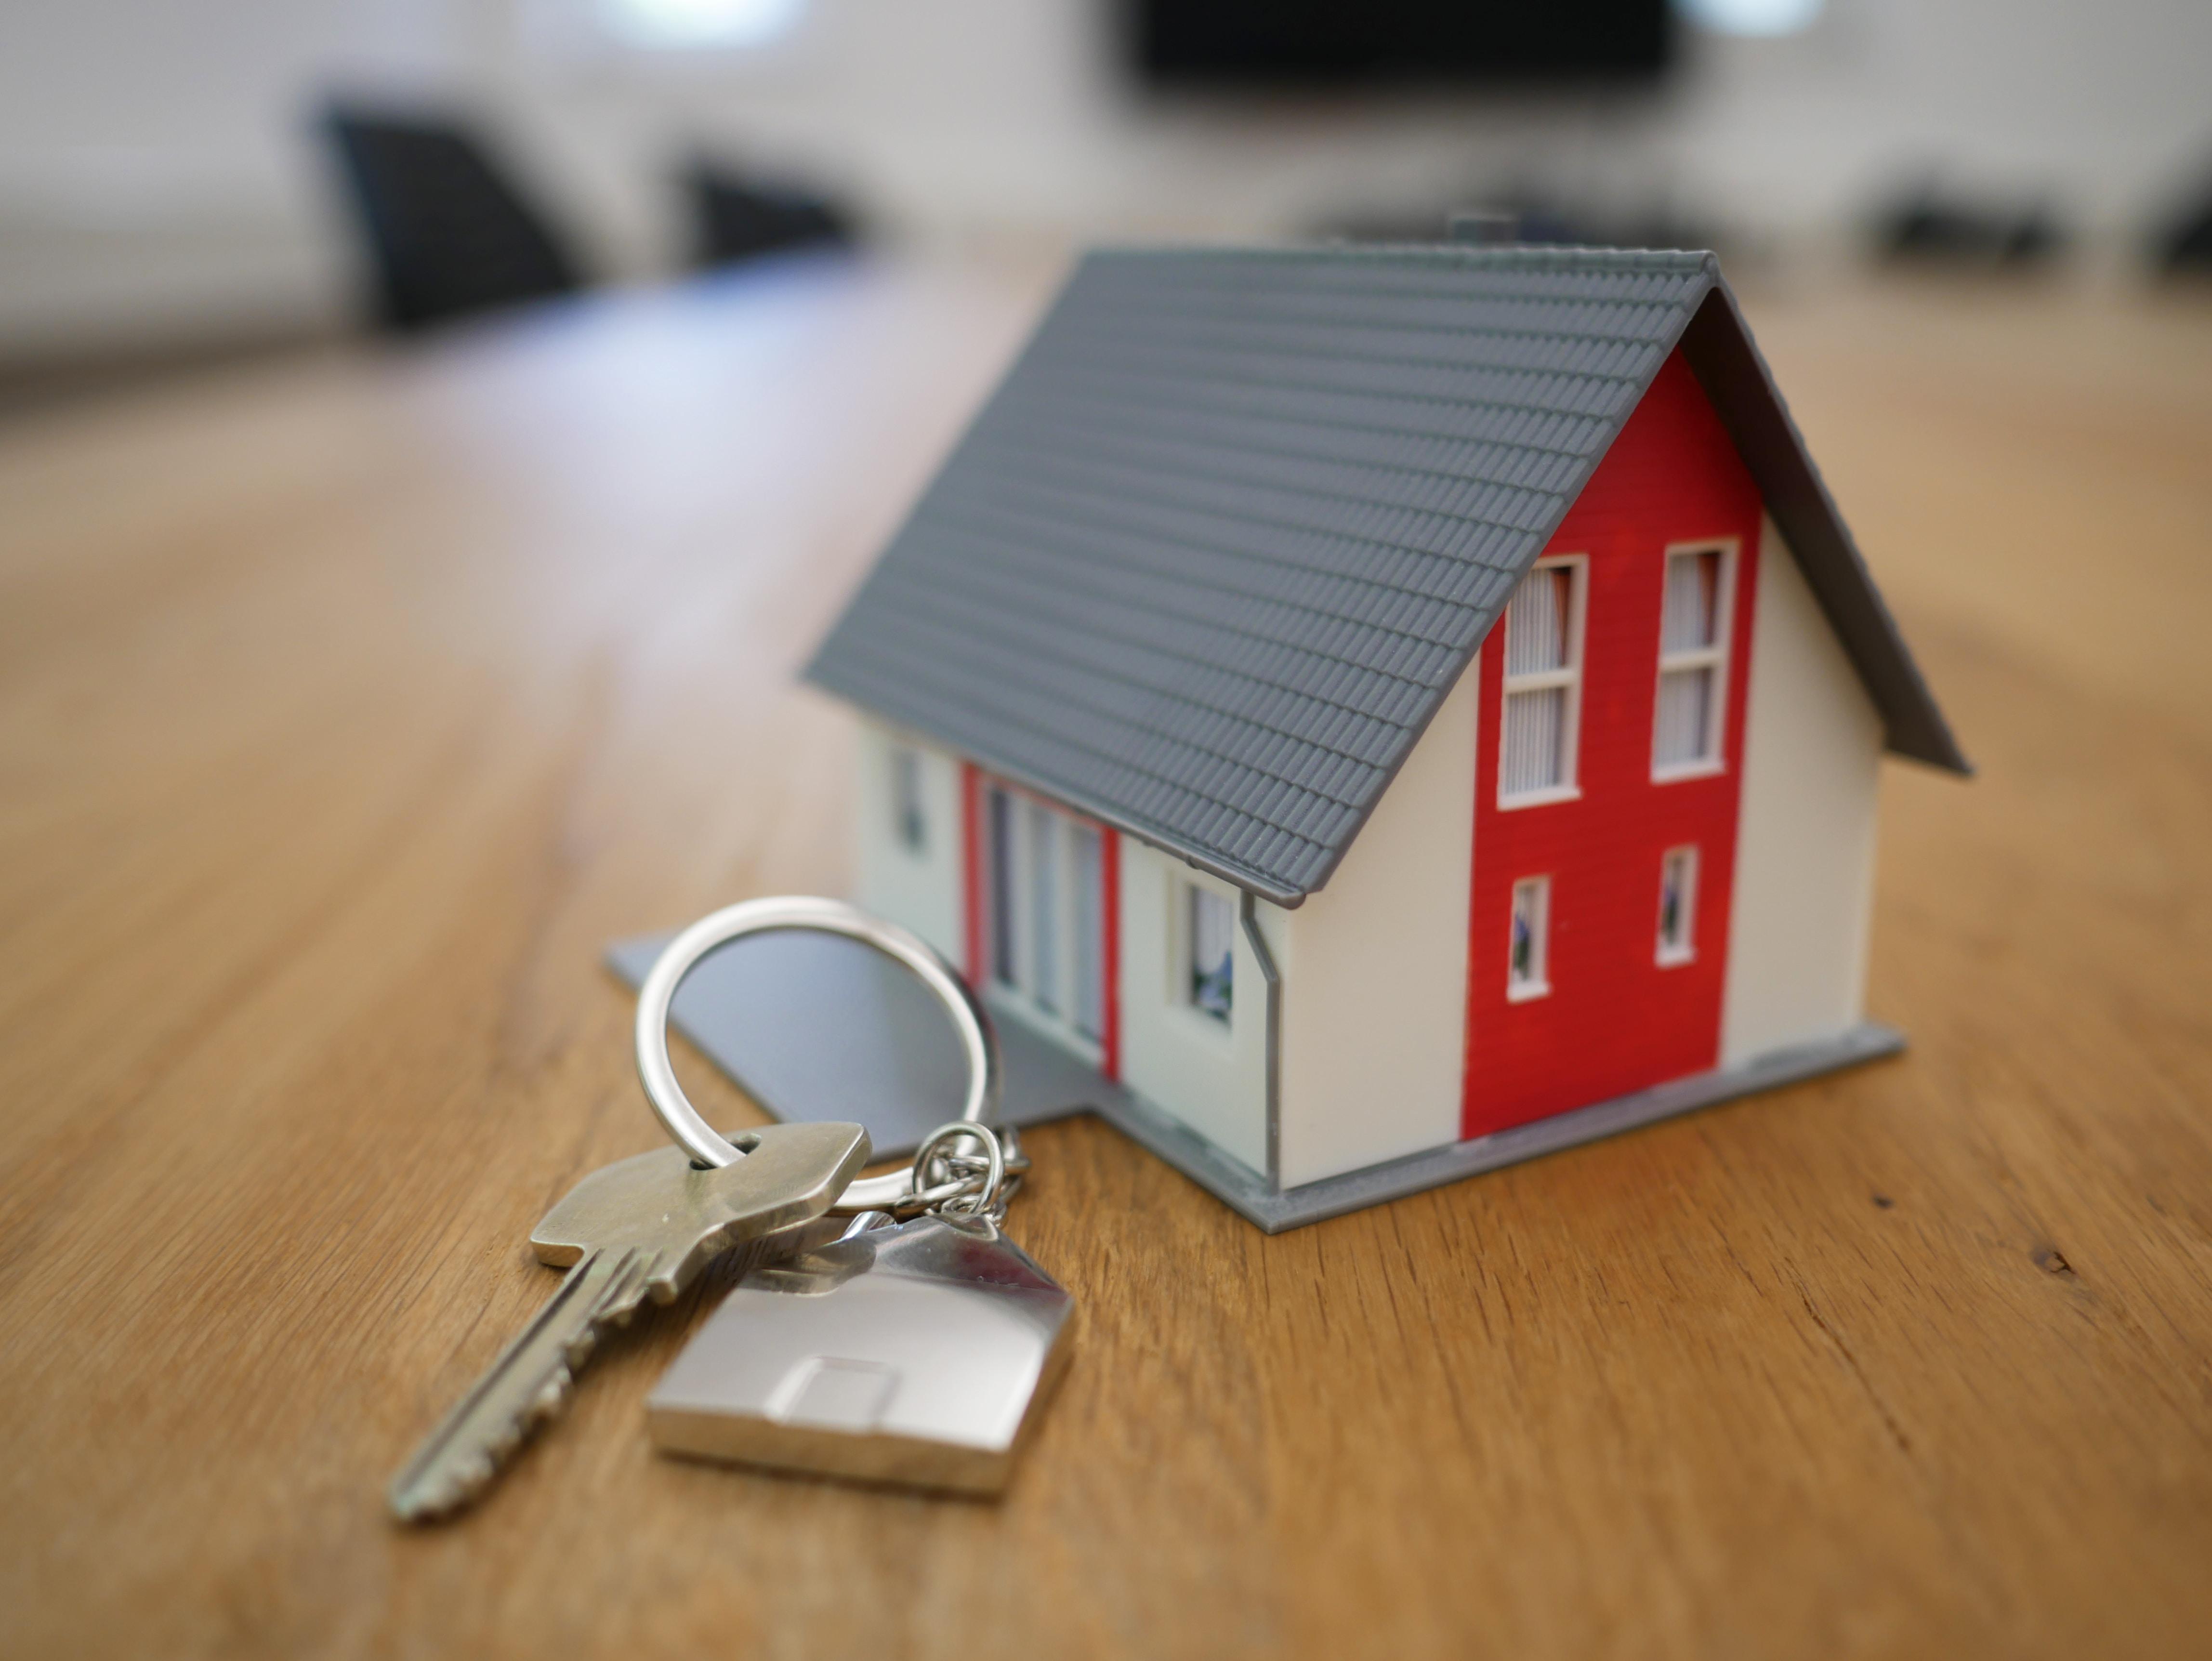 A house keyring.